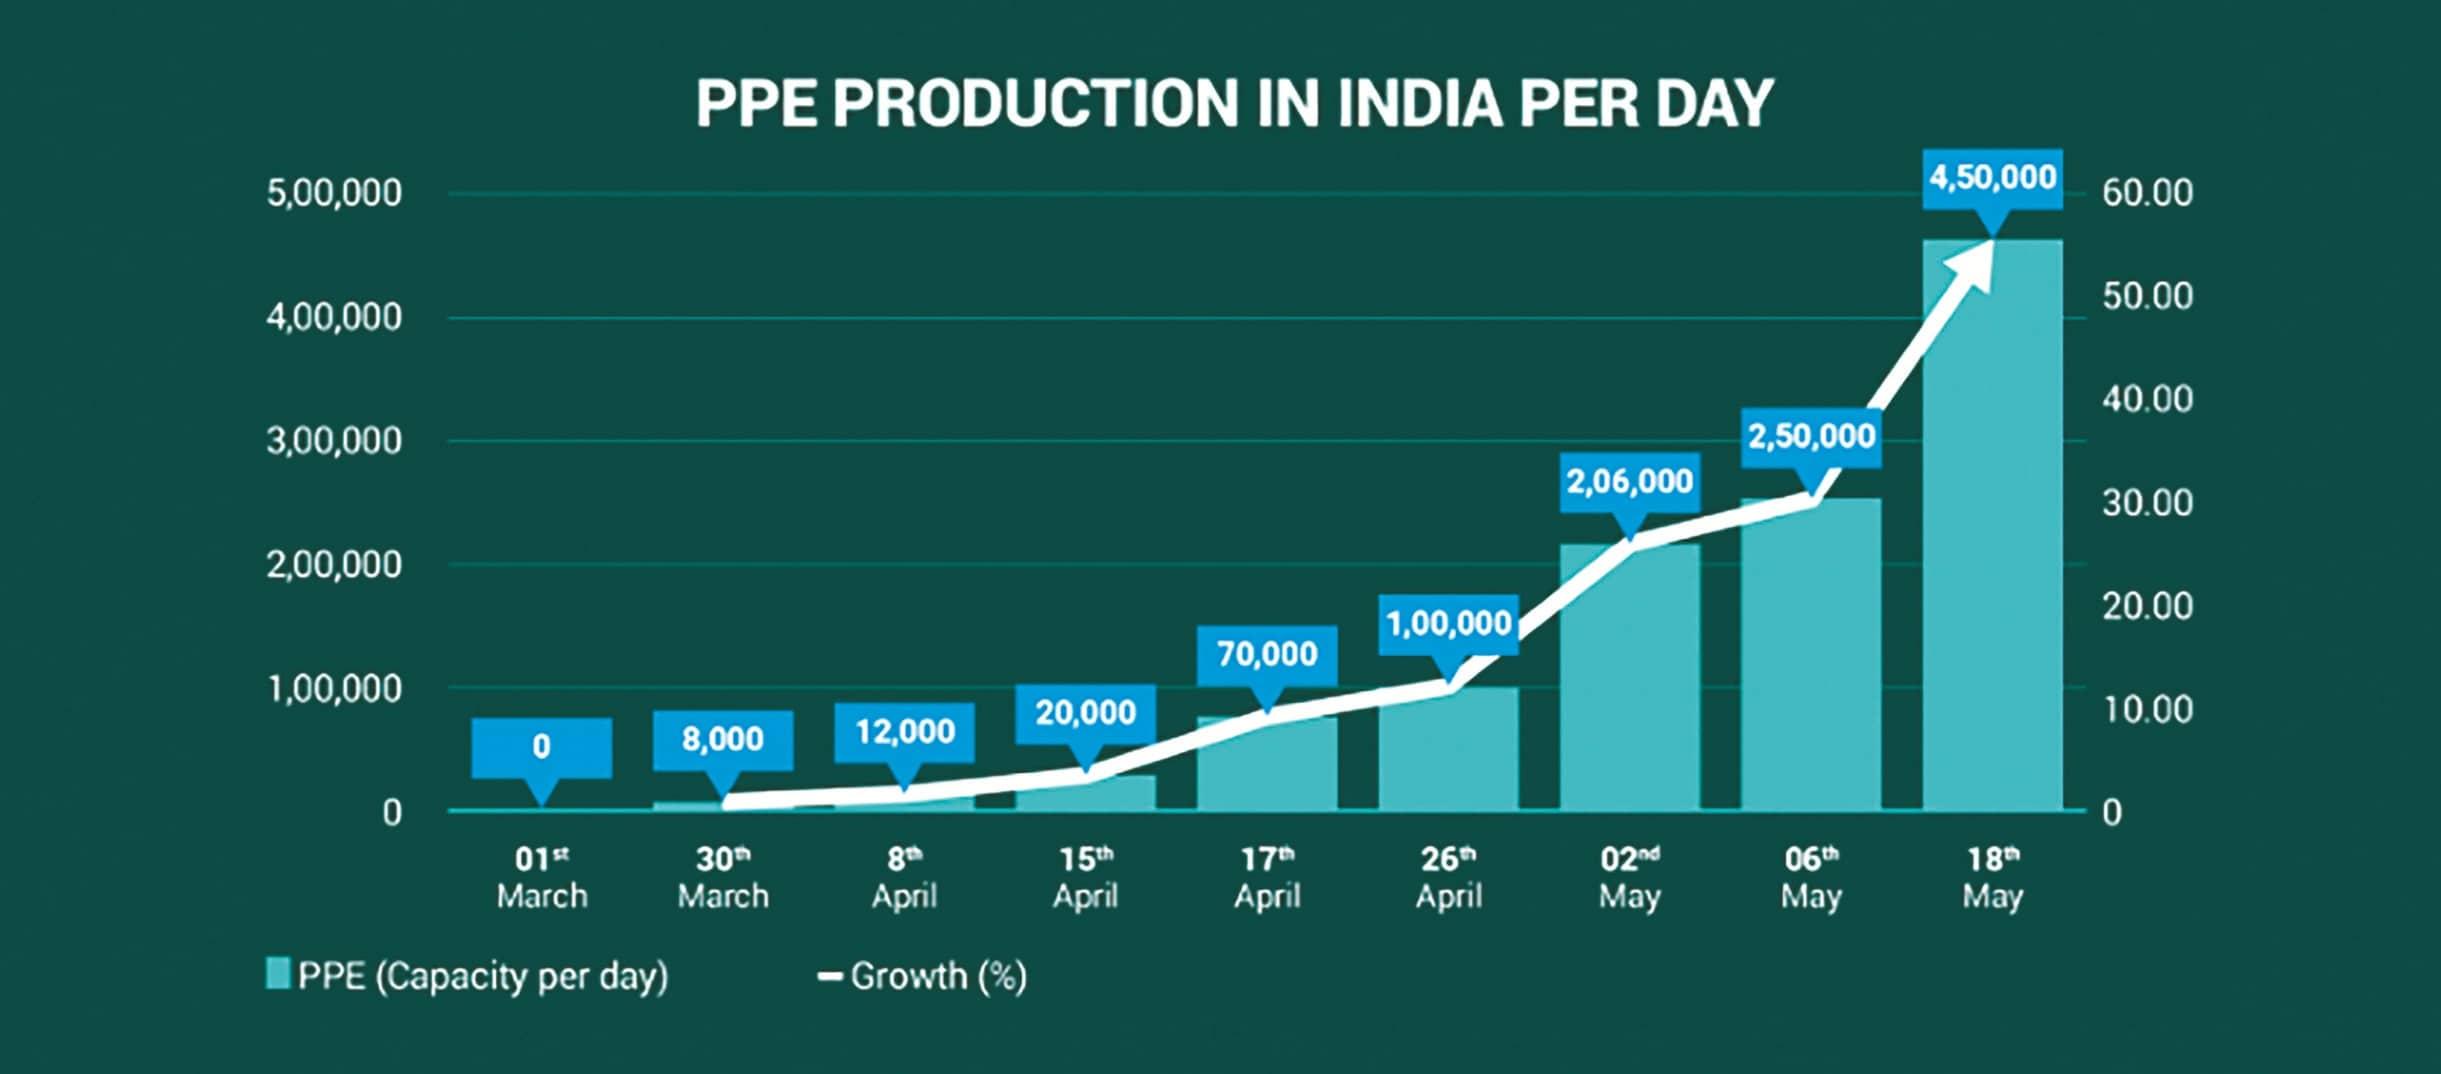 INDIA INCHING TO BE GLOBAL PPE HUB